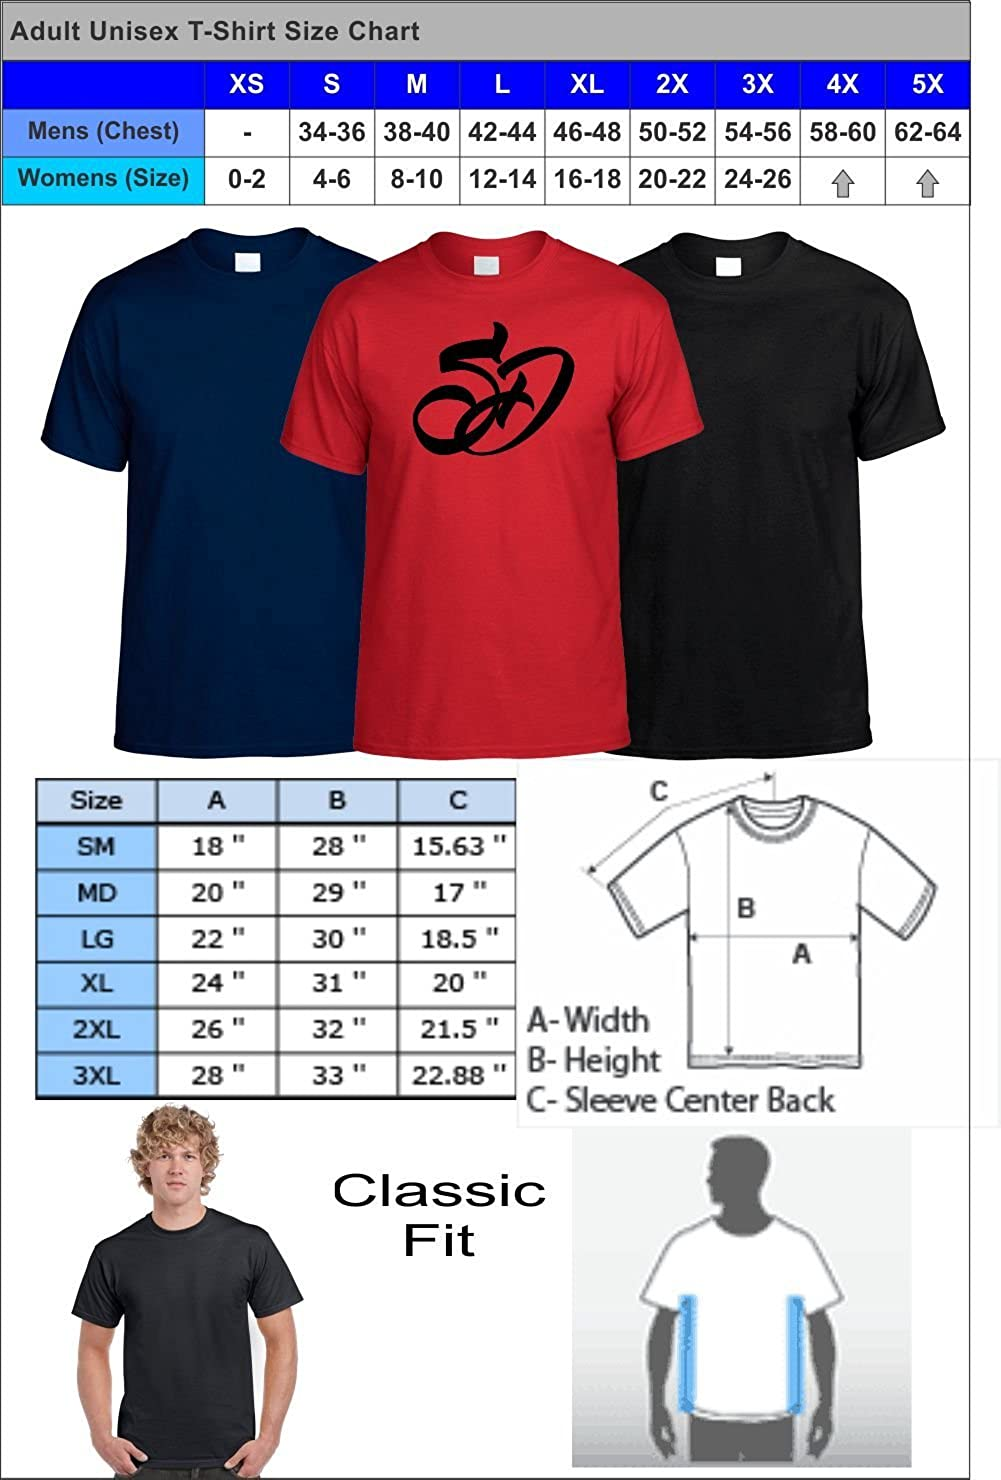 3e10a71b1b2 Amazon.com: Signature Depot Barack Obama T-Shirt (OBAMA 44) Mens, Womens,  Youth, Juniors, Long, etc, tee: Clothing